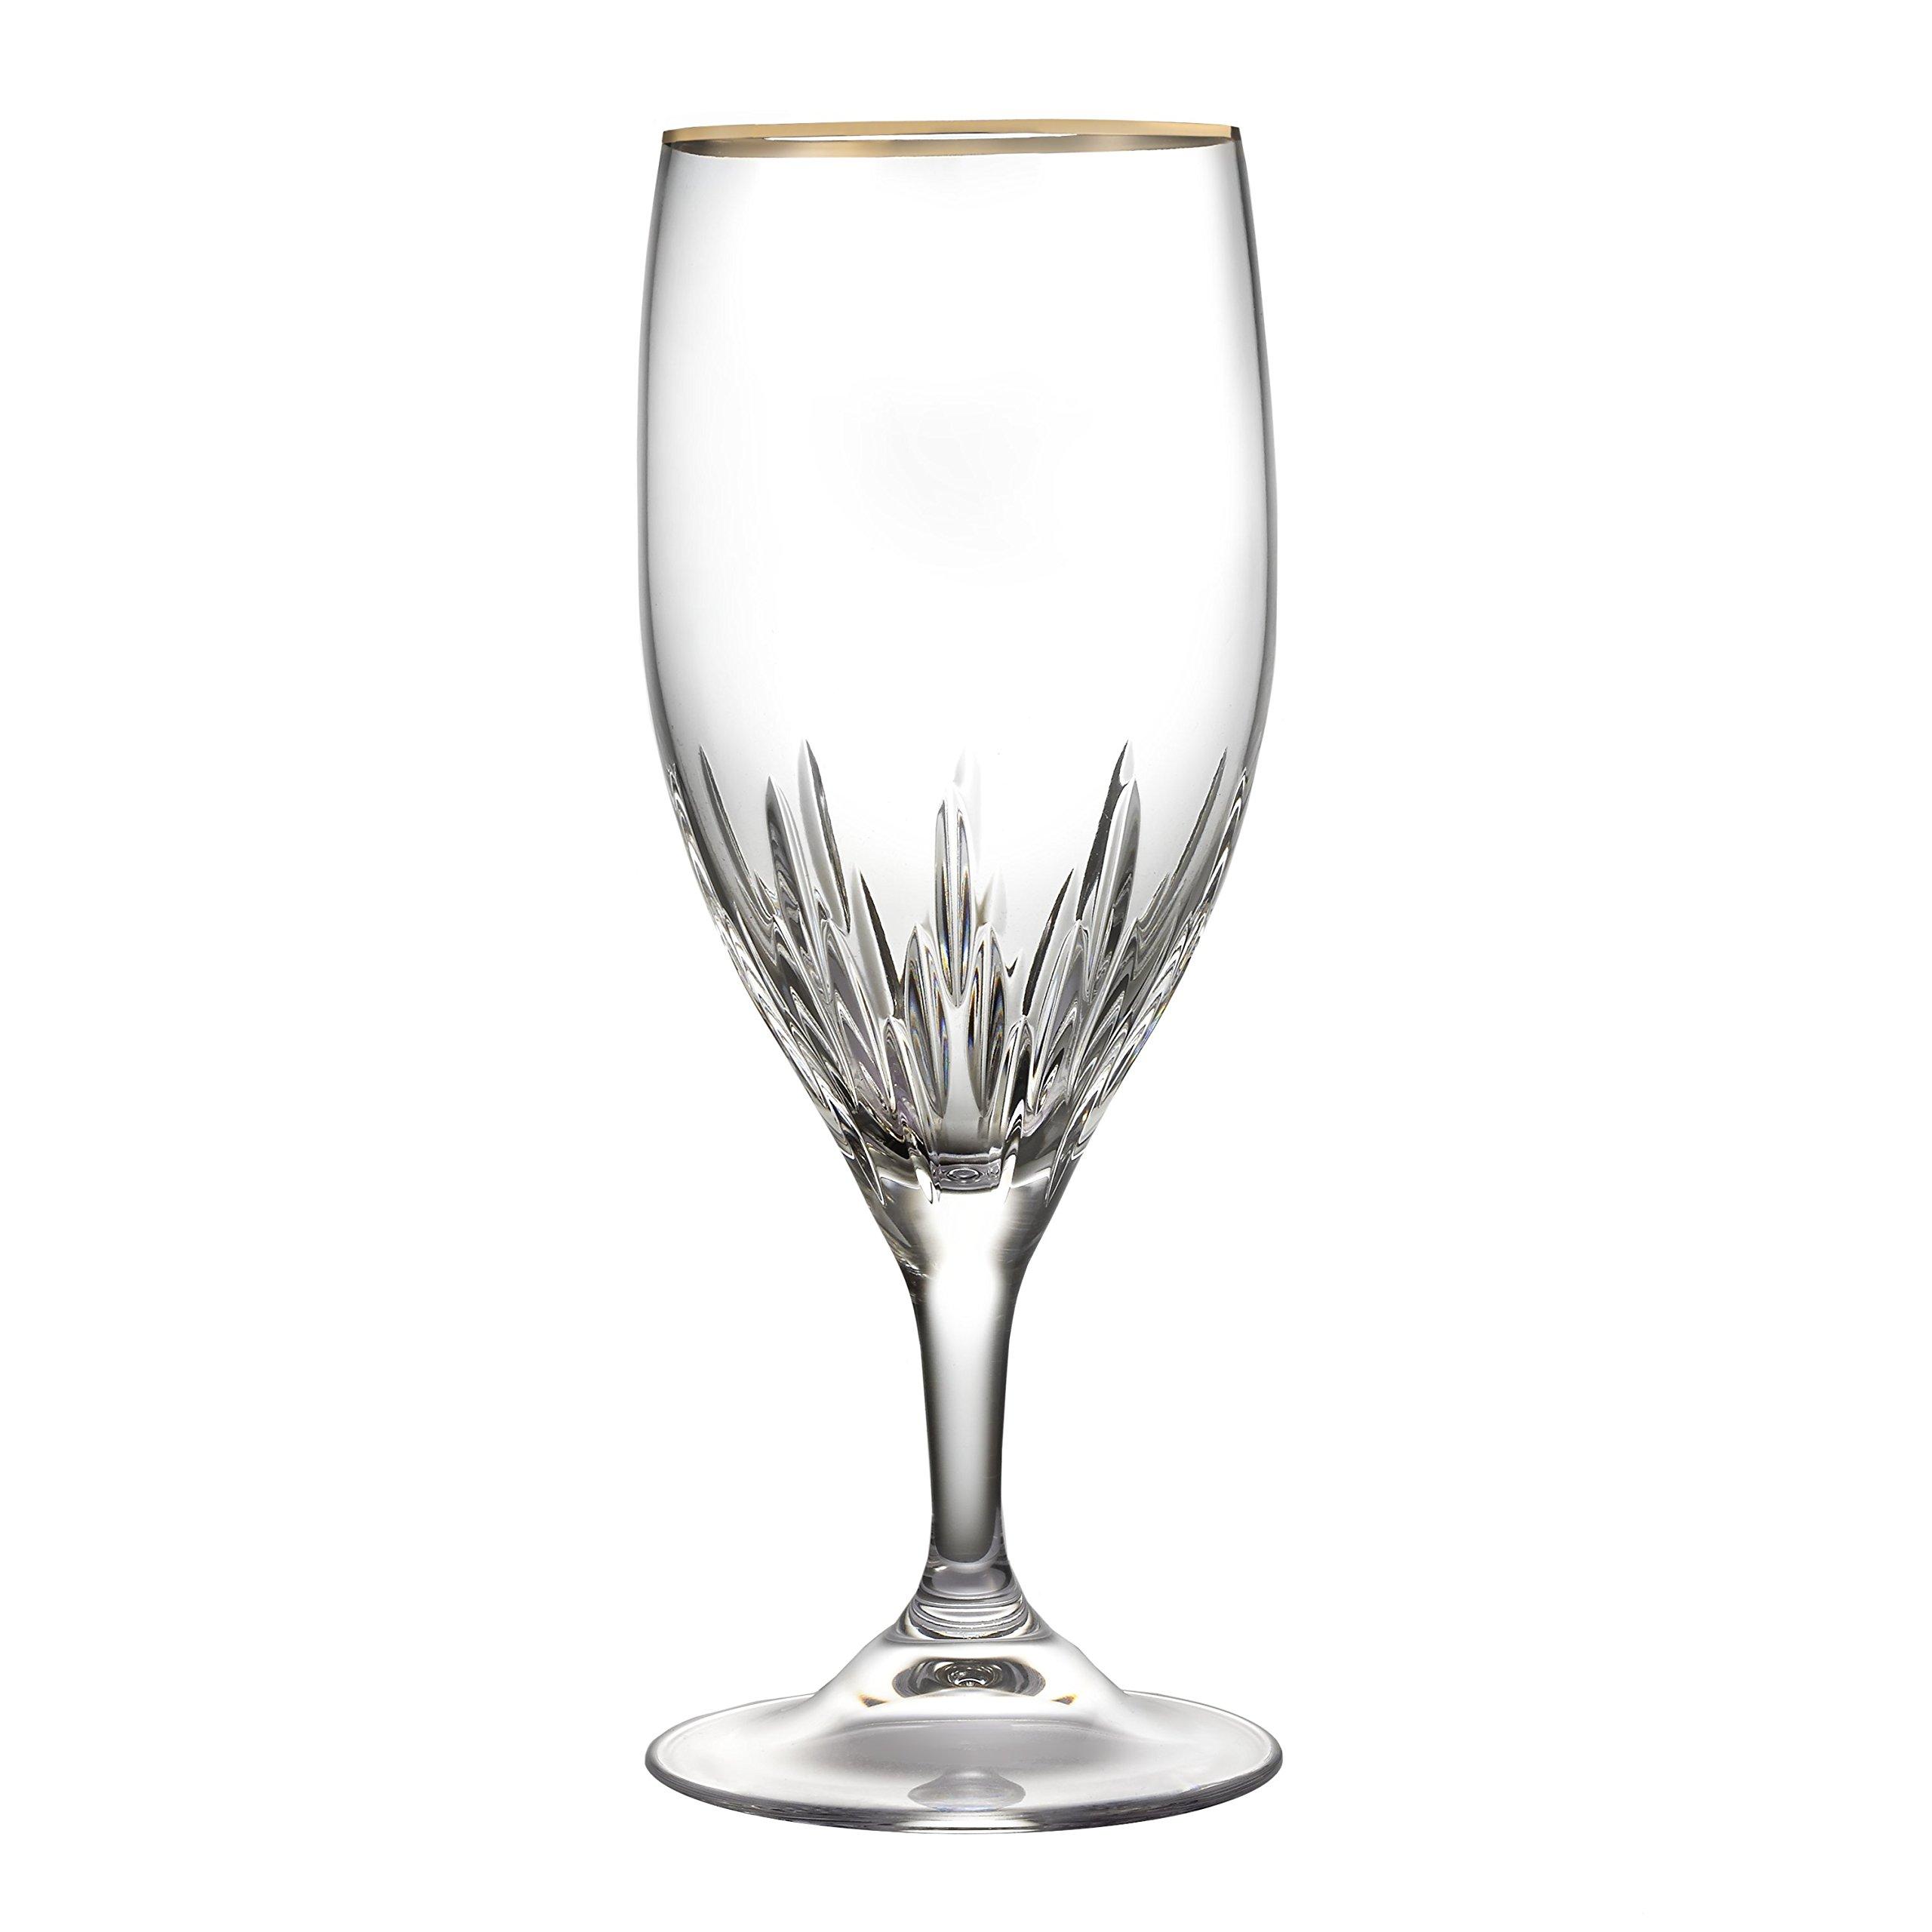 Vera Wang Wedgwood Duchesse Iced Beverage, Gold